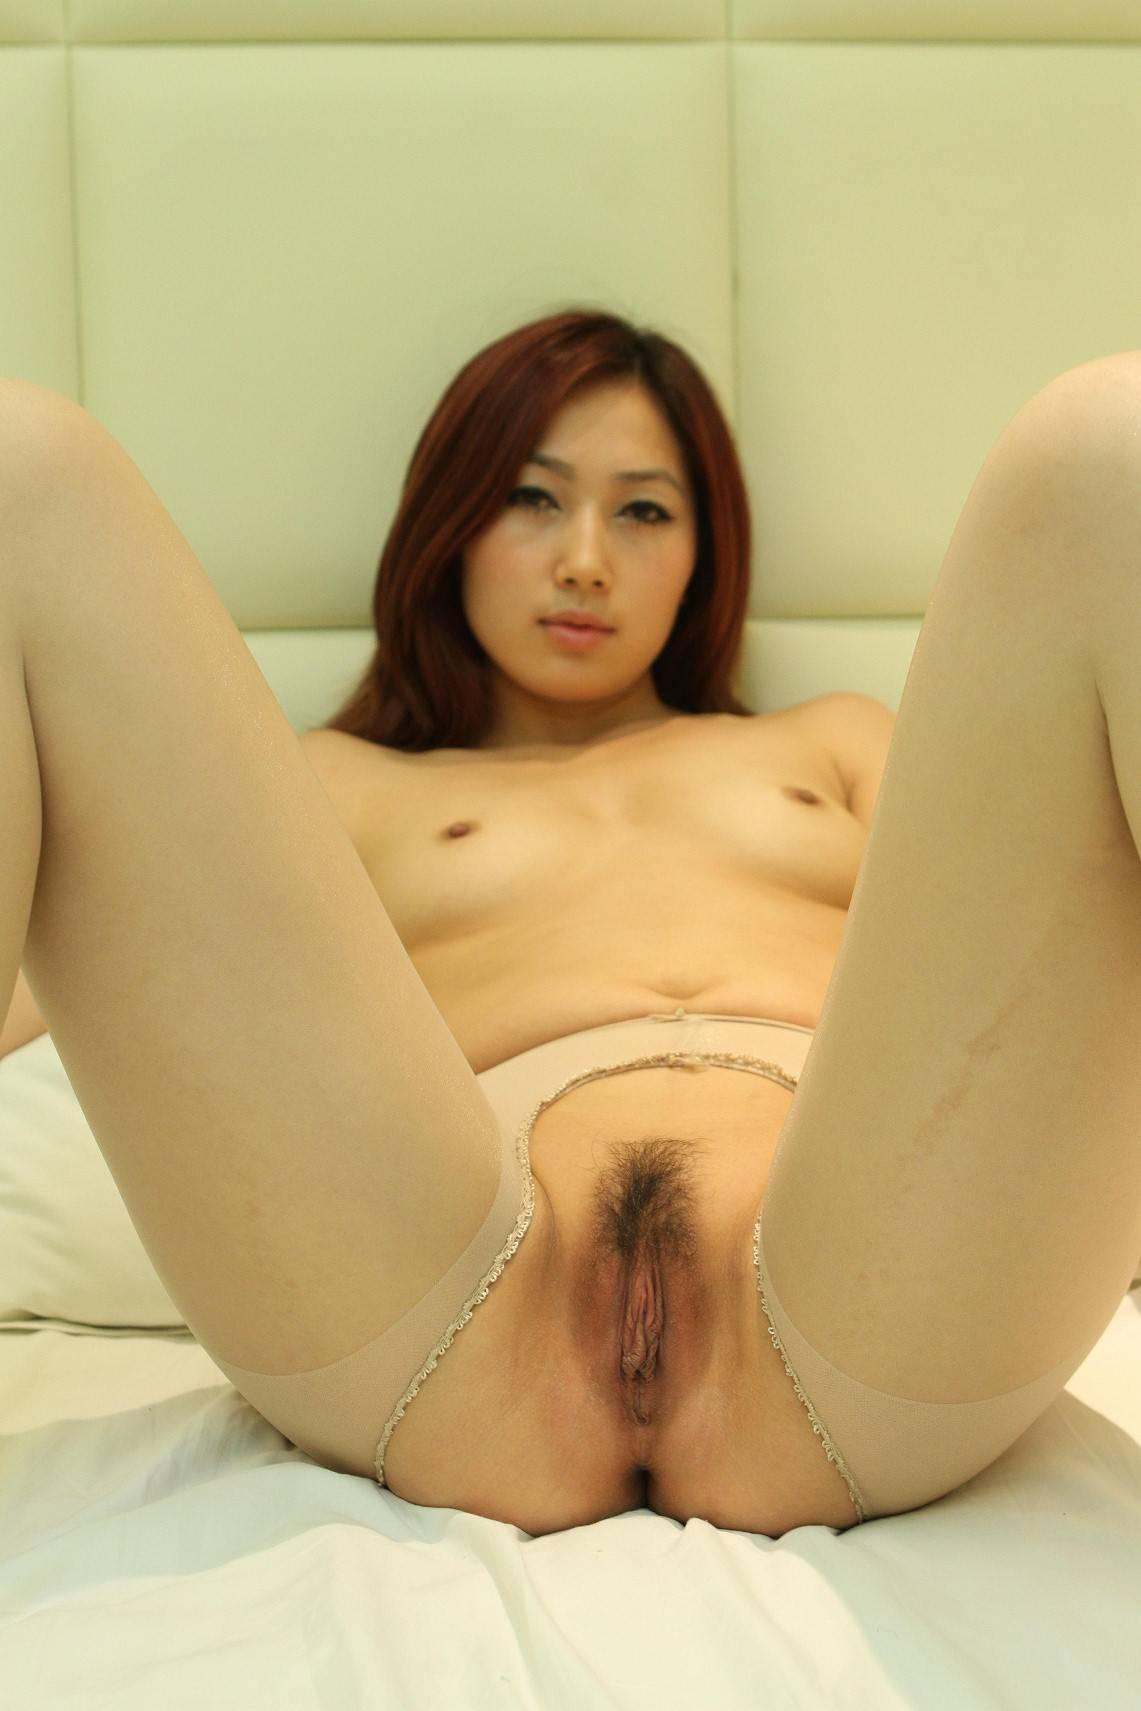 Memek lower gadis jepang masih menggunakan stocking